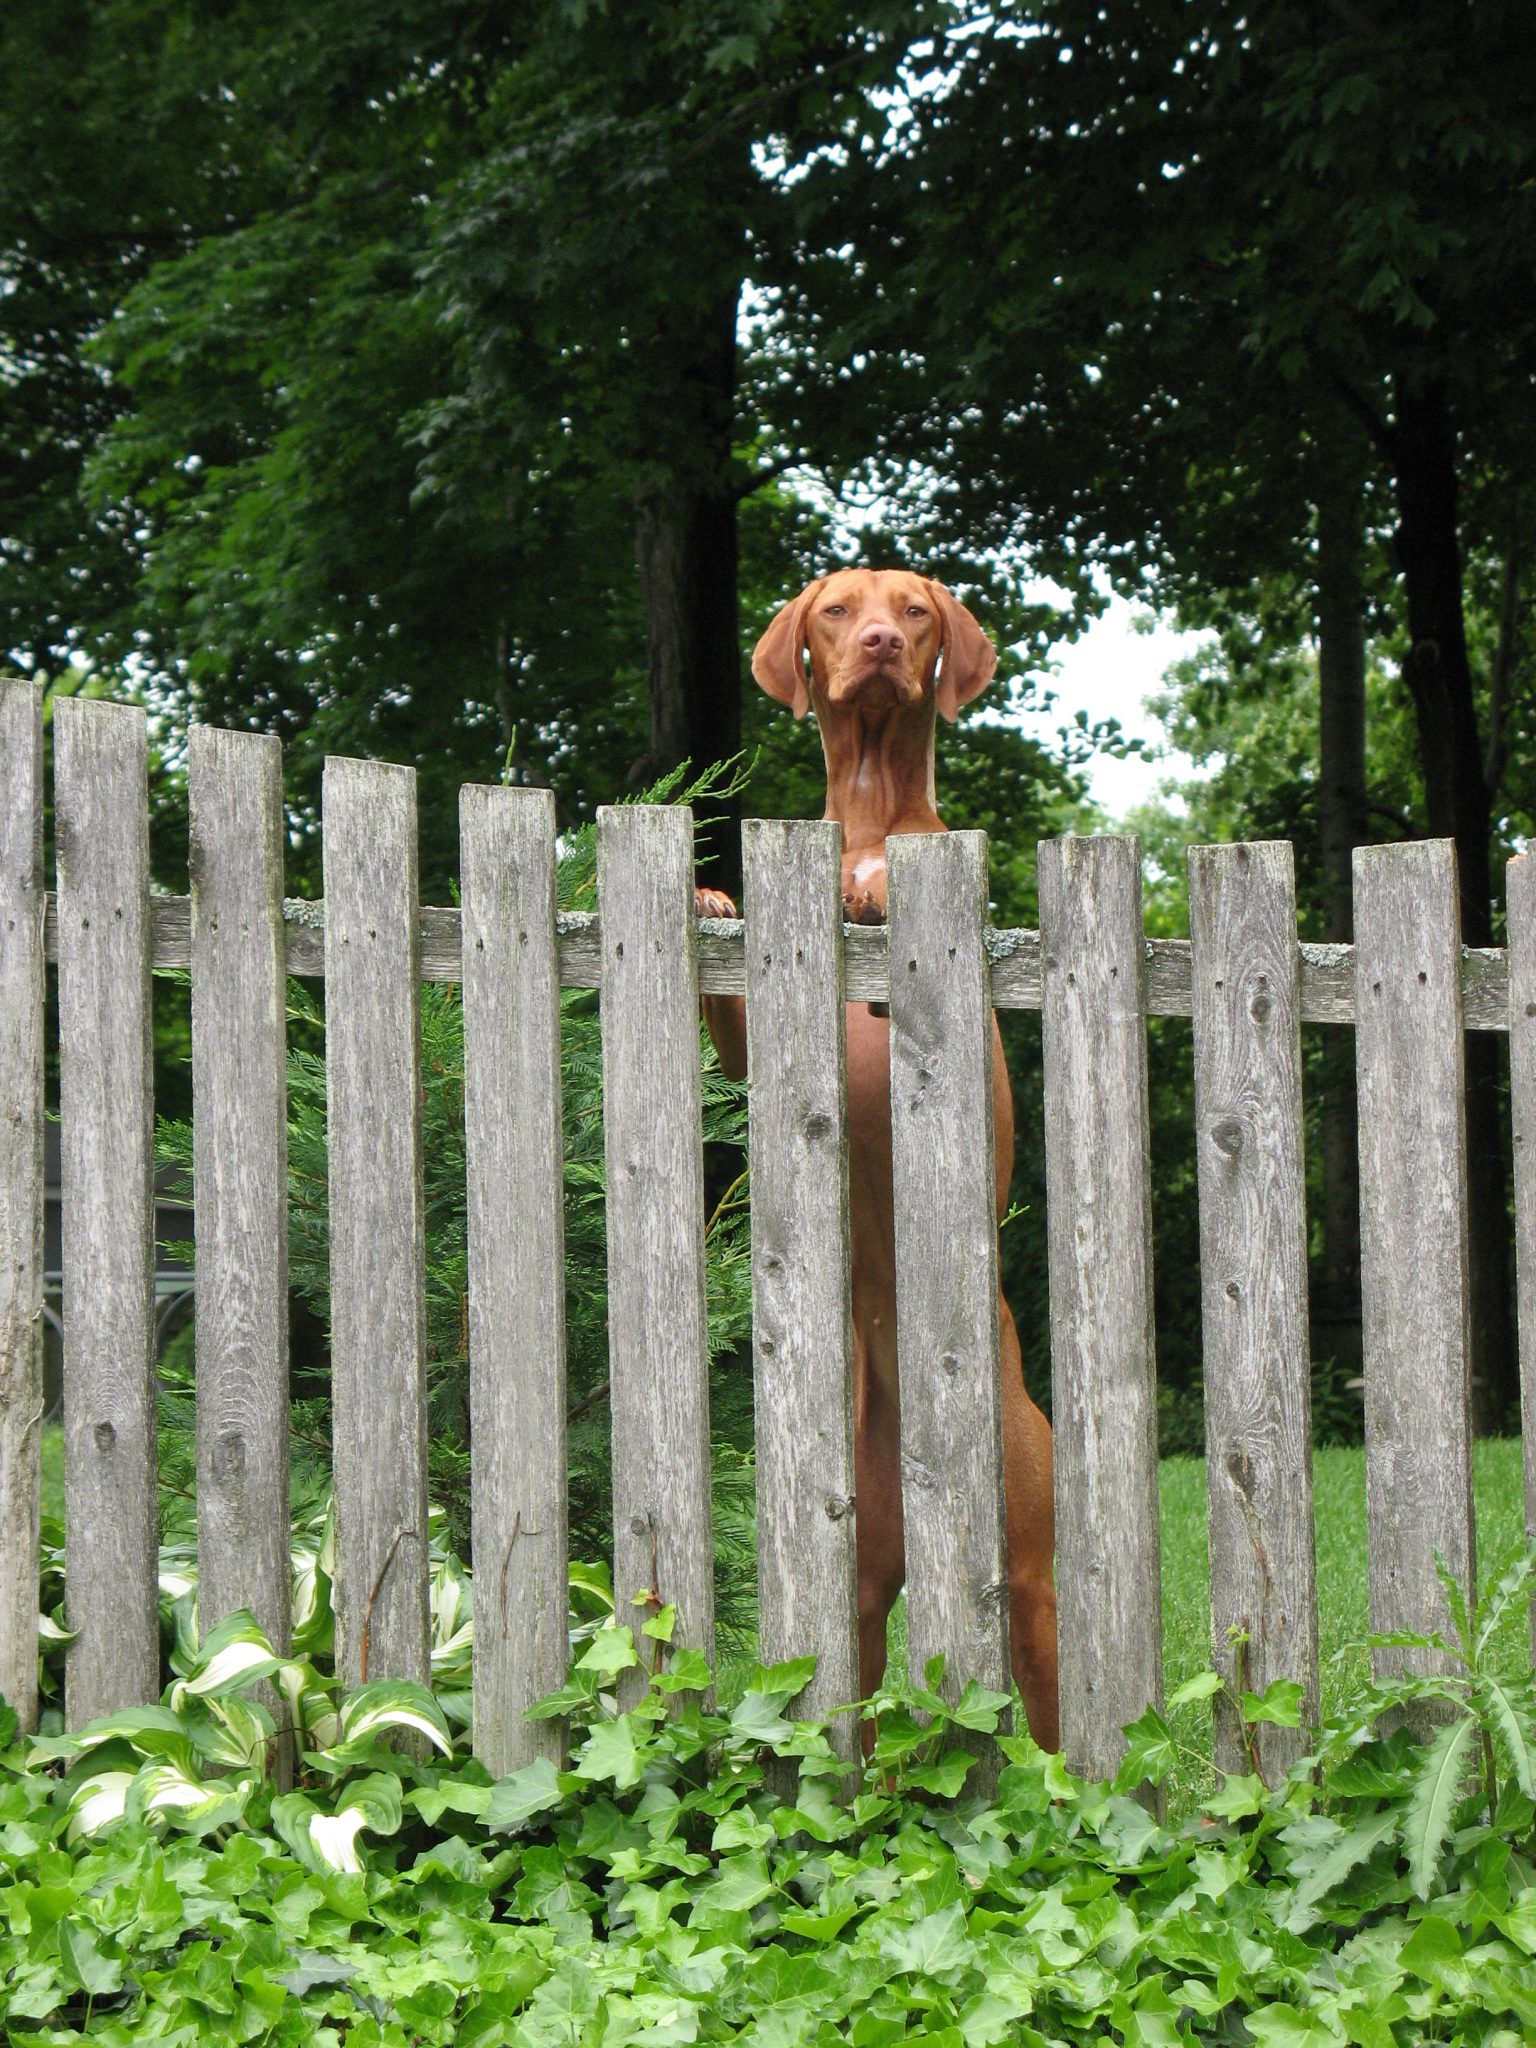 Large dog looks over fence